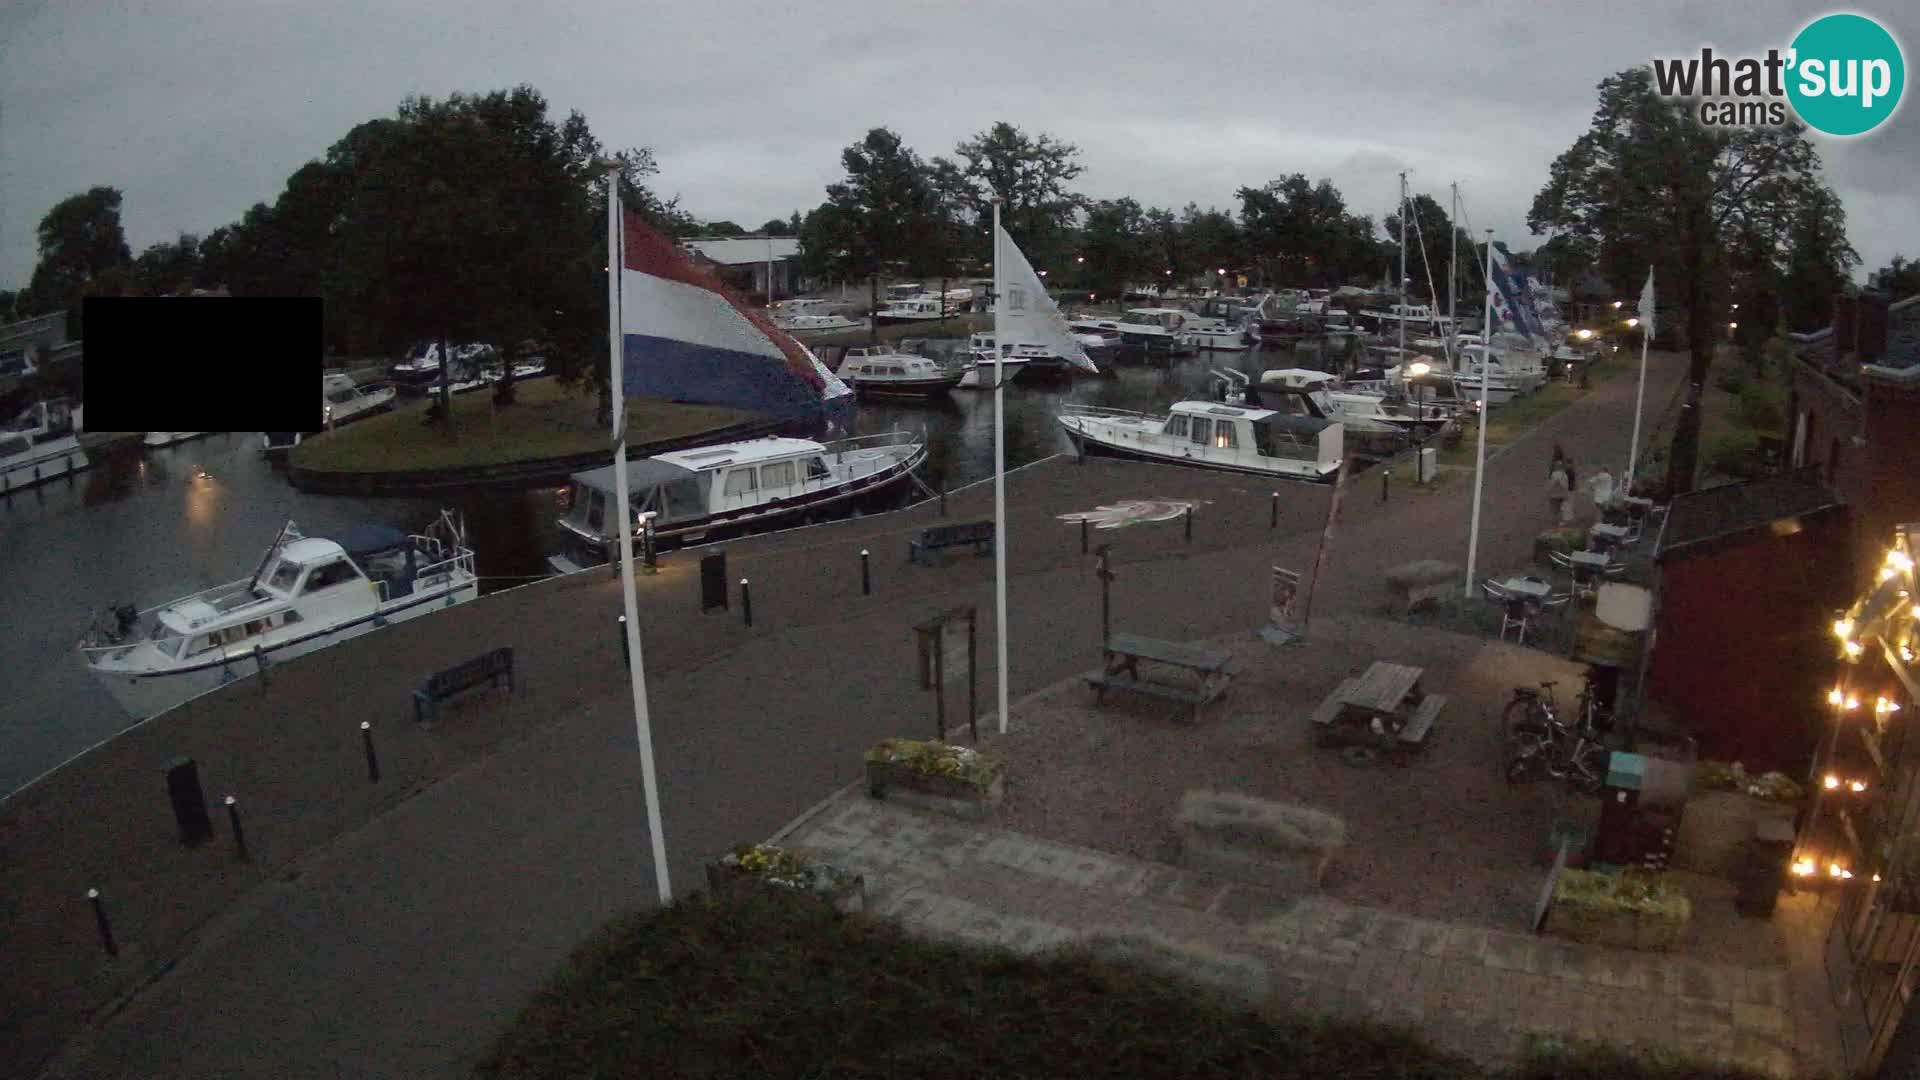 Il porto Joure webcam live